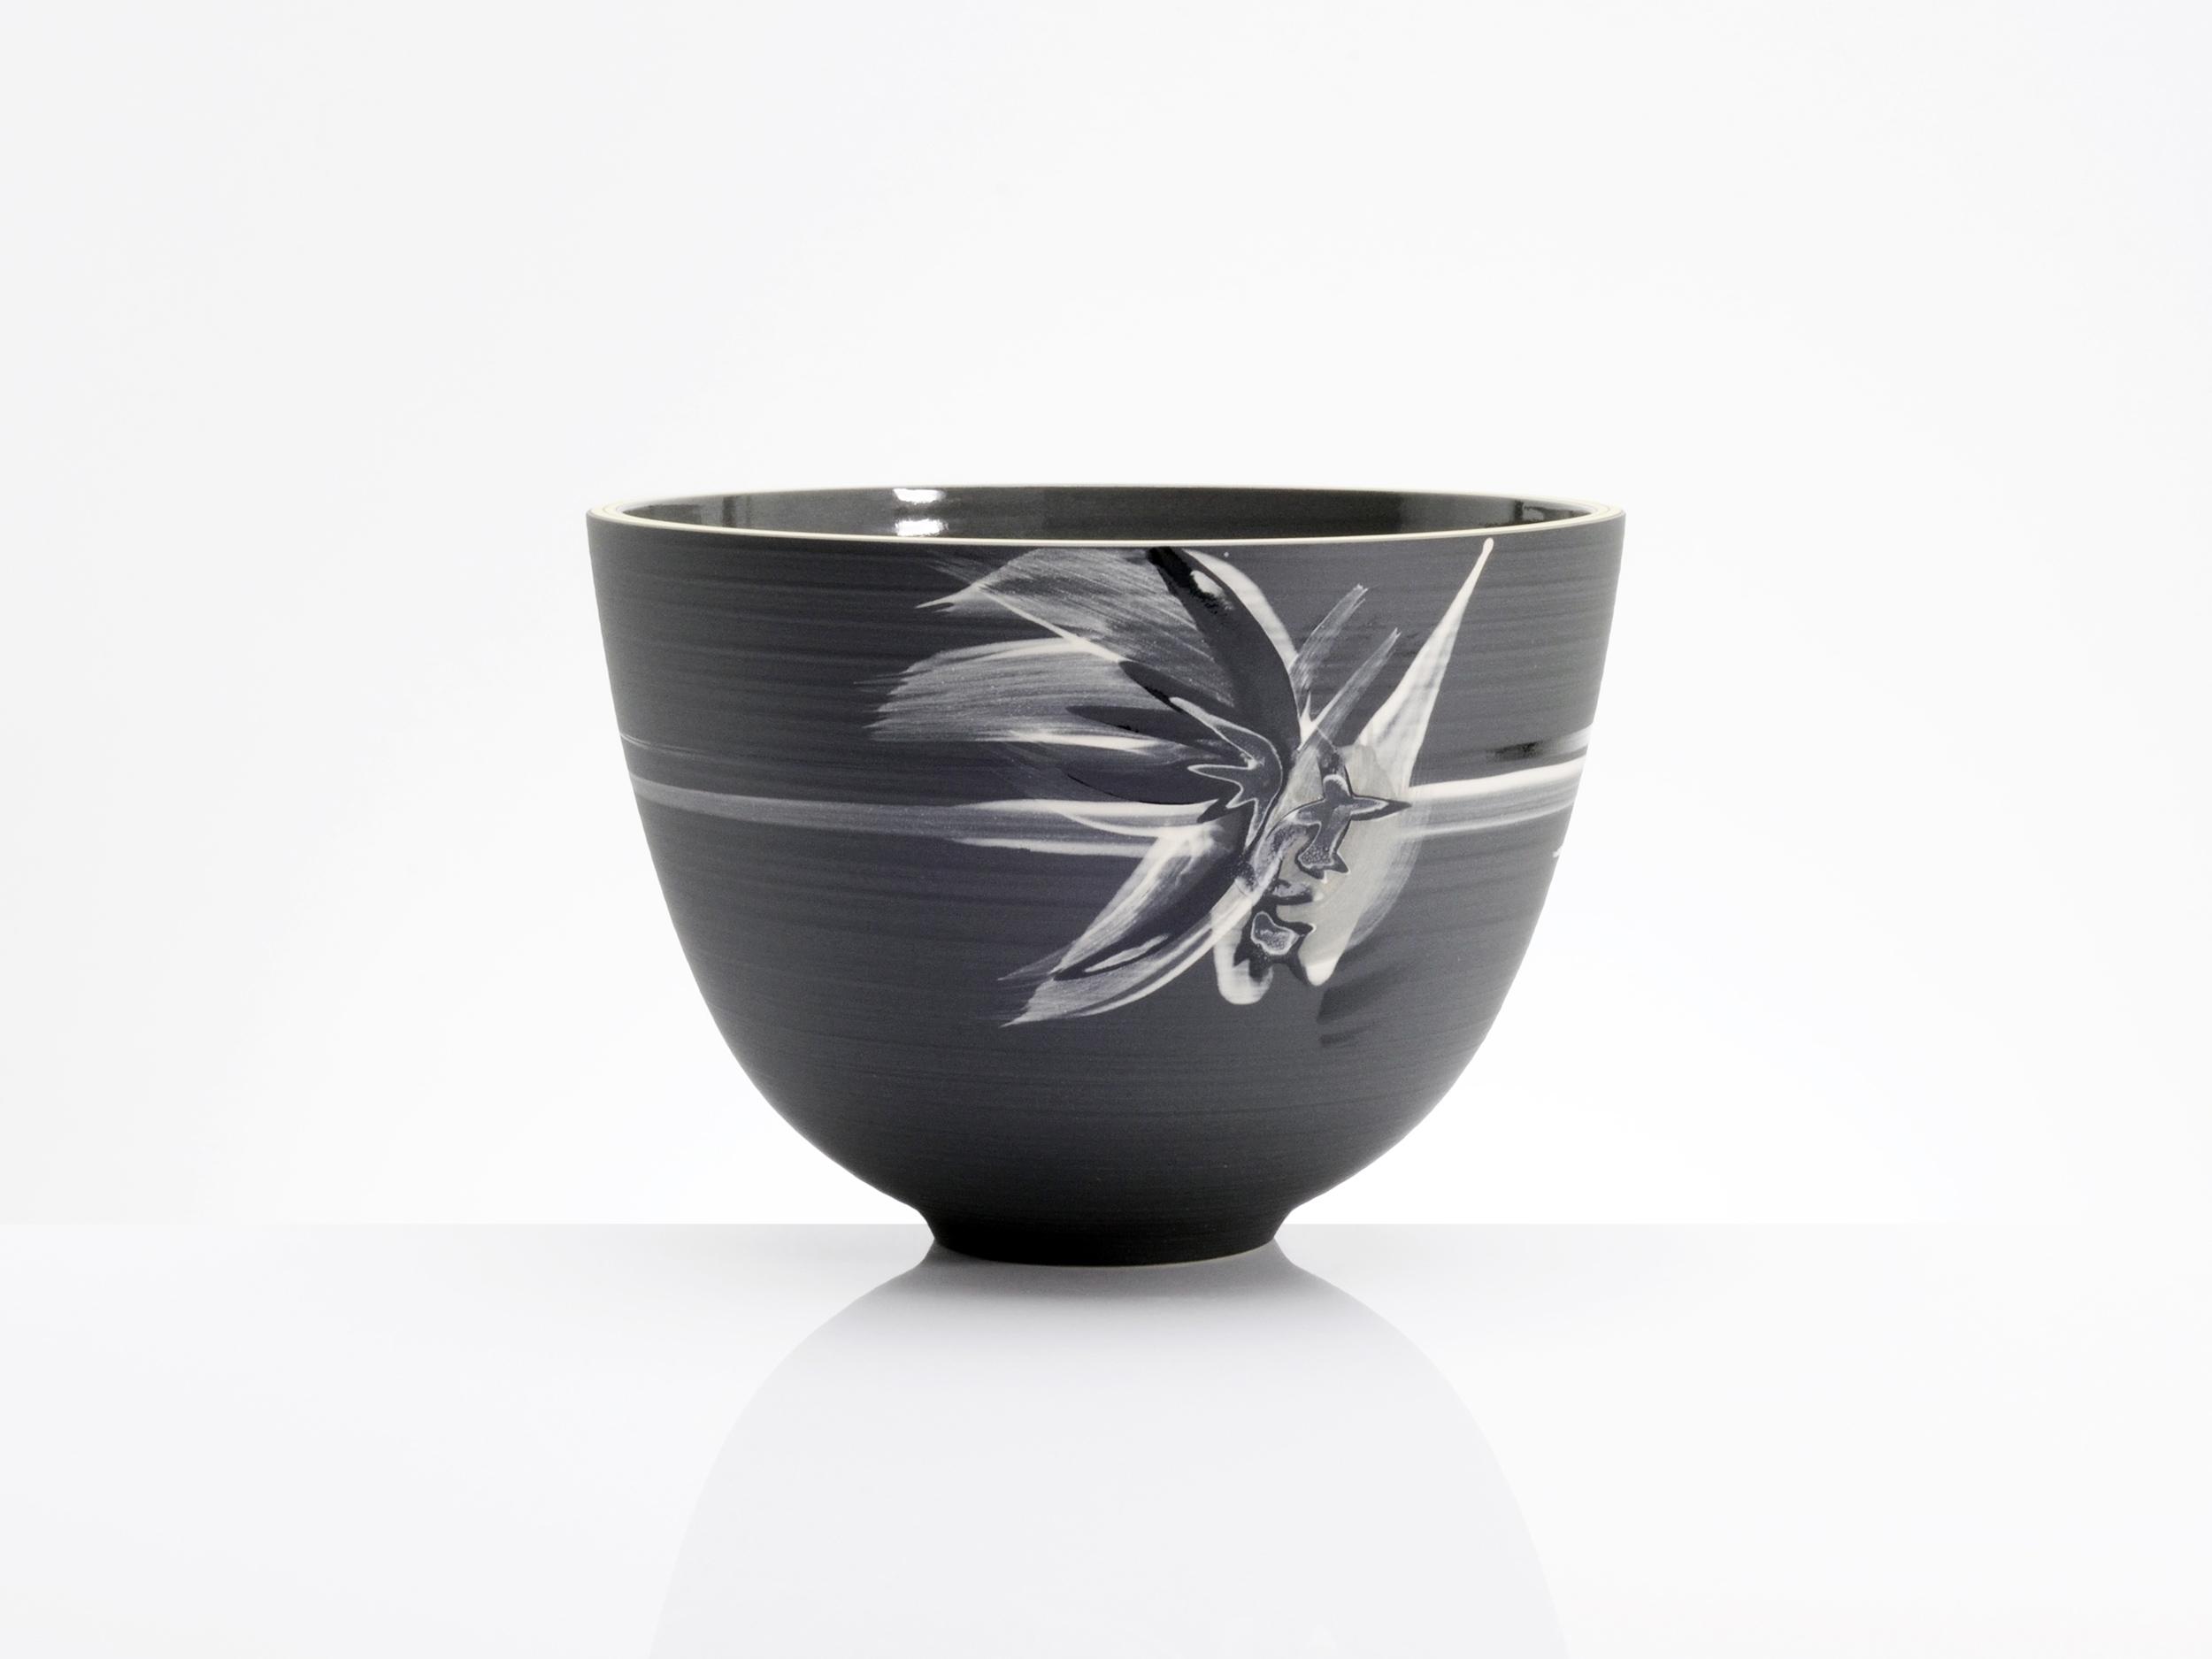 Shuriken Star Wars Black Bowl by Rowena Gilbert